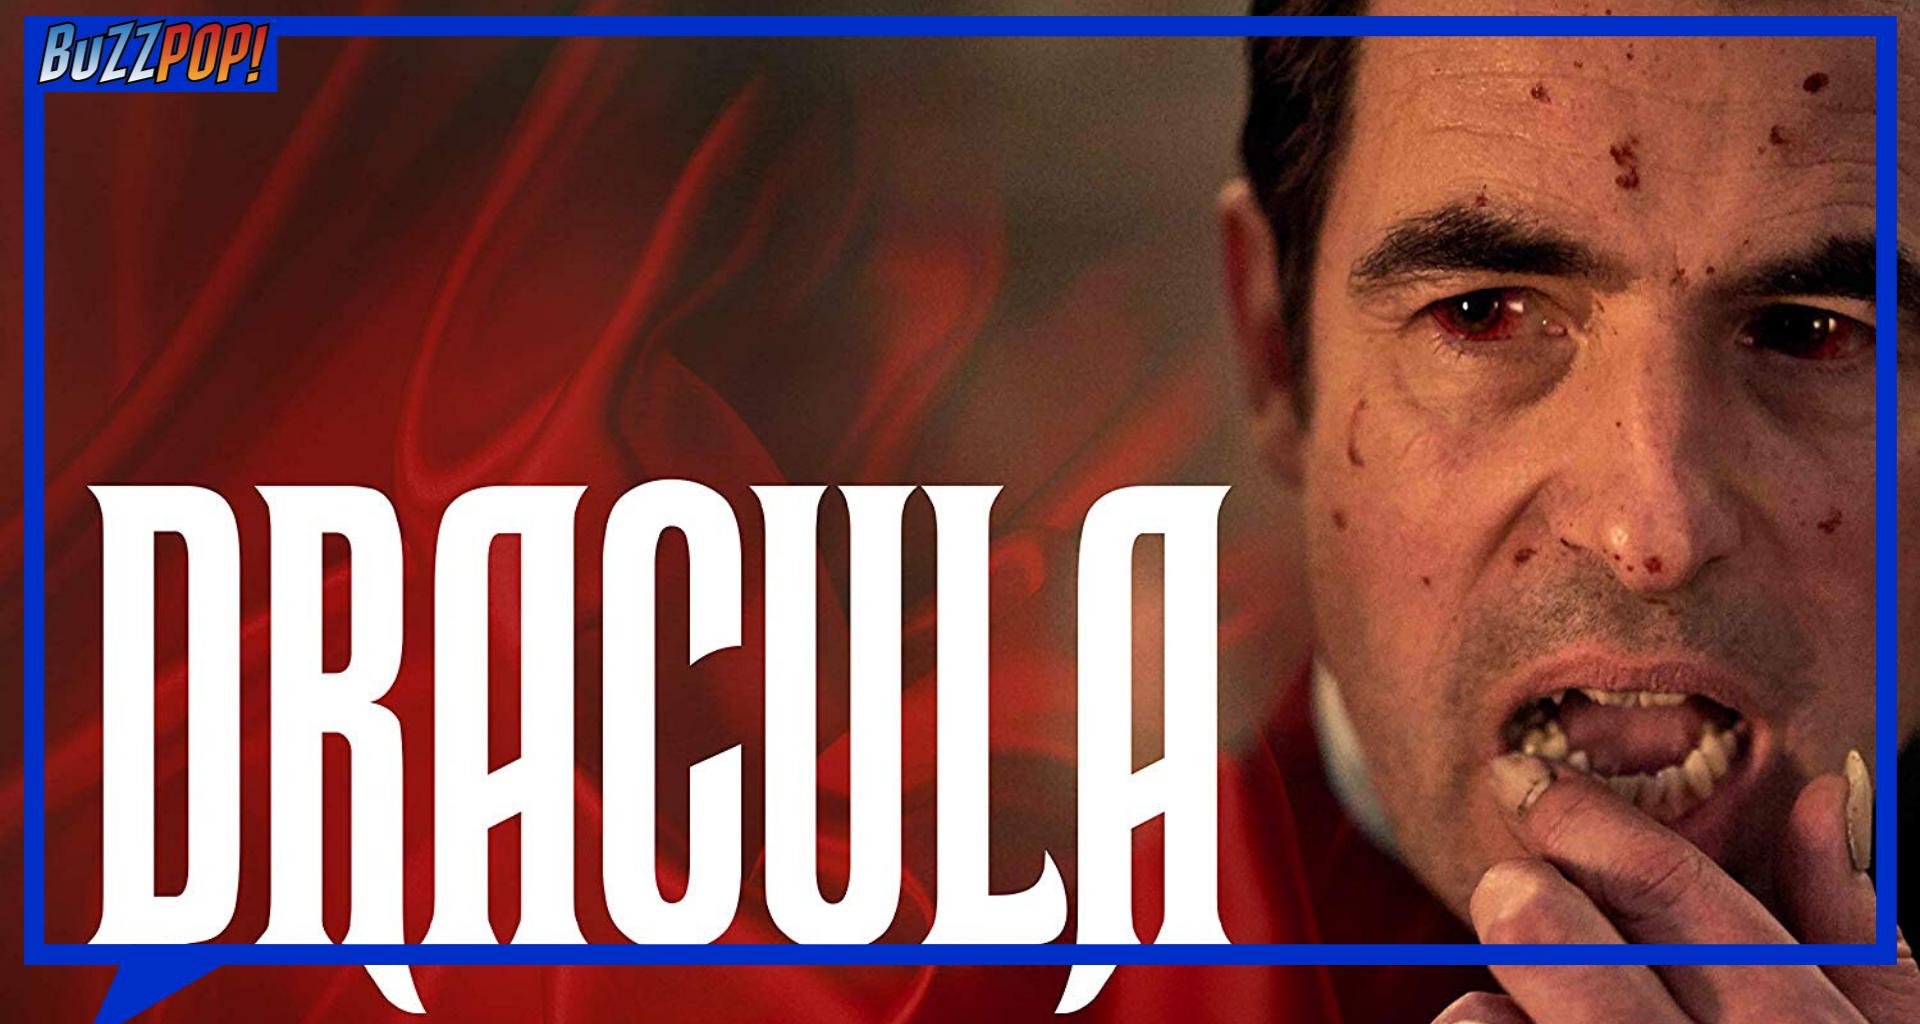 BBC's DRACULA